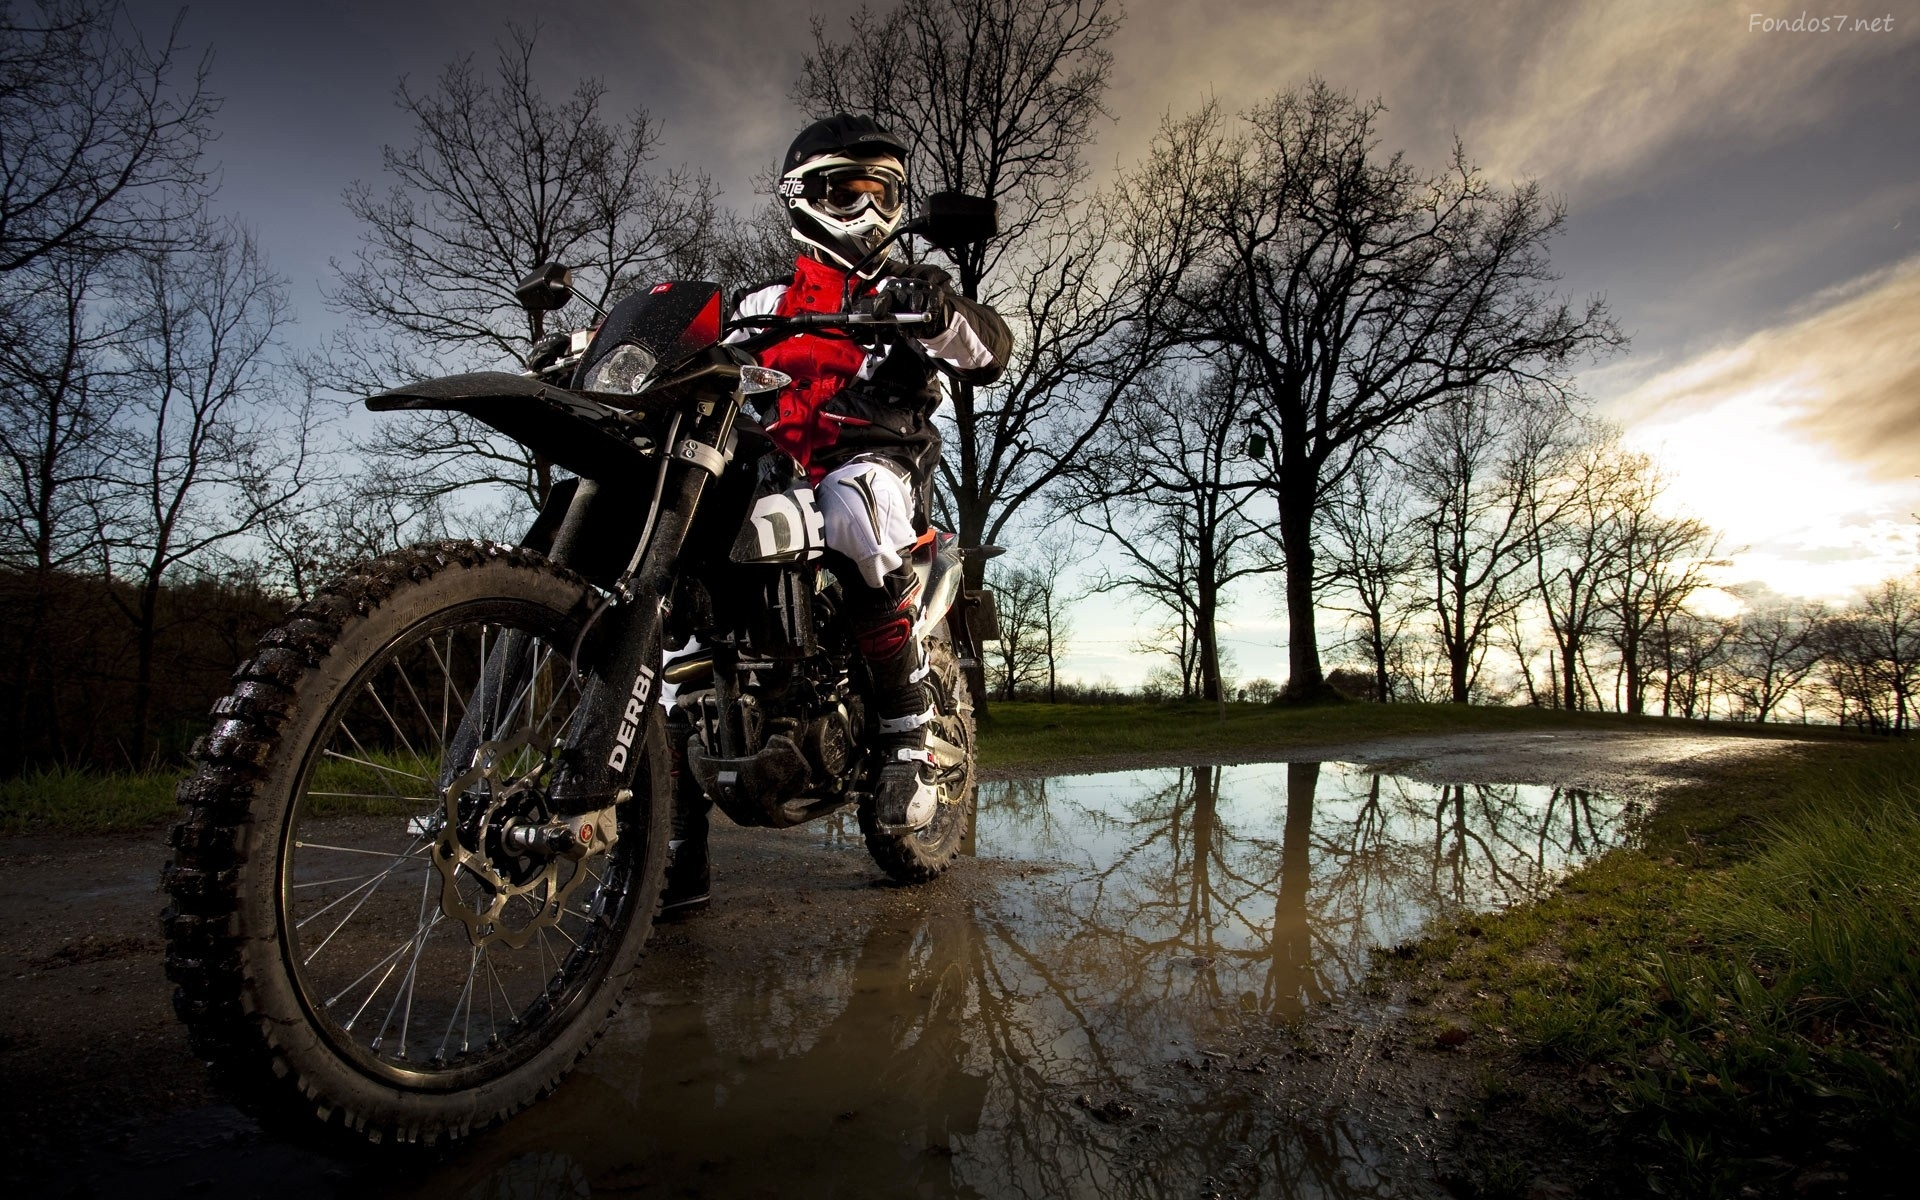 motocross wallpapers hd yapa   Taringa 1920x1200